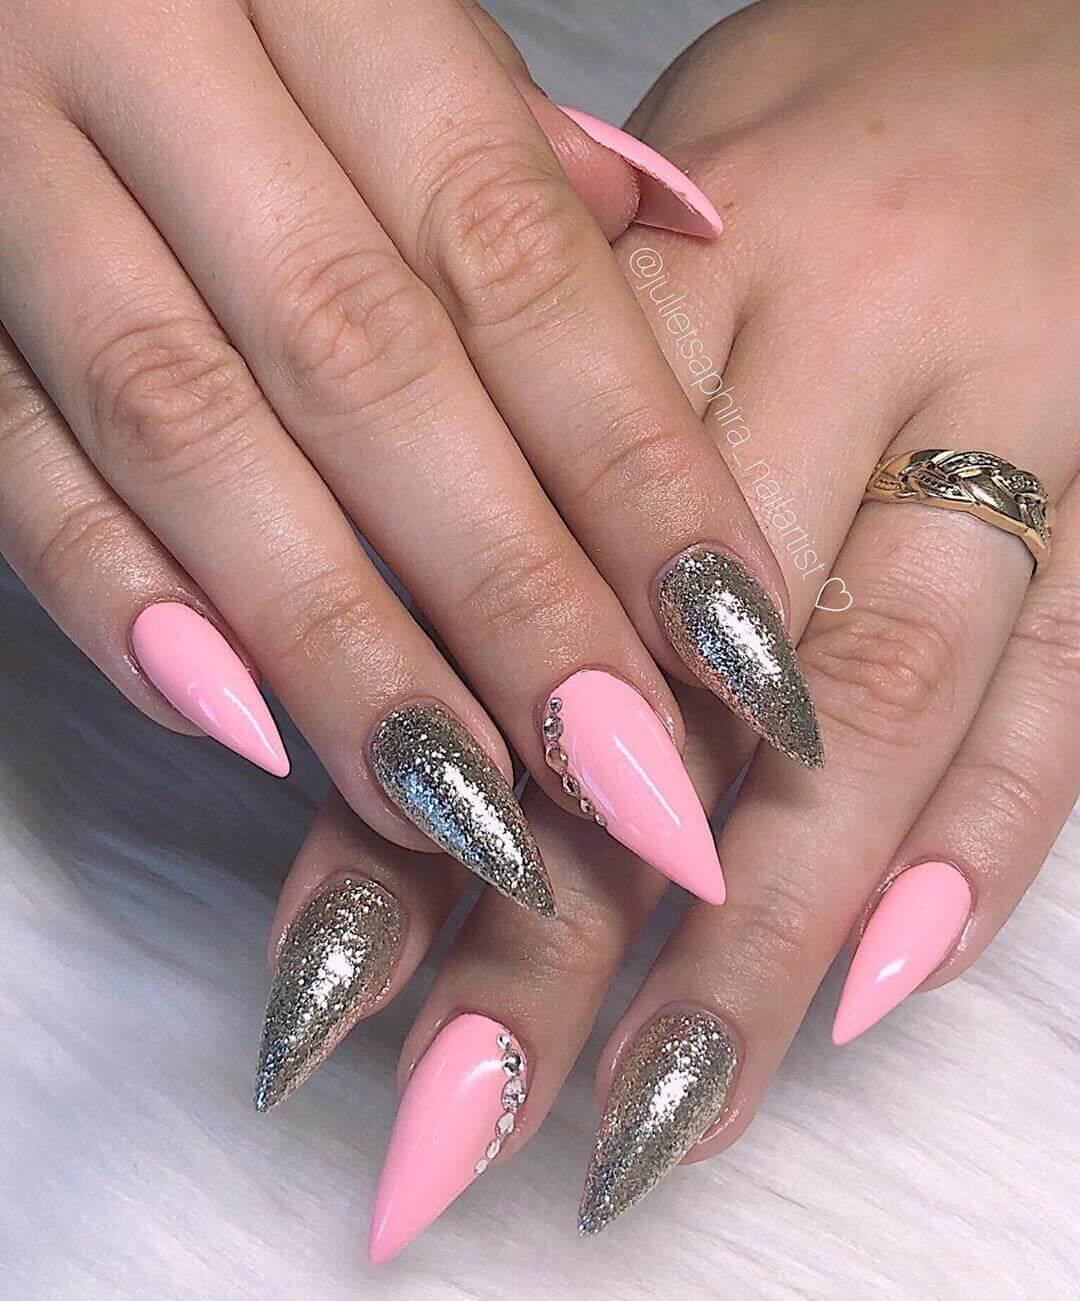 uñas acrilicas doradas con rosa